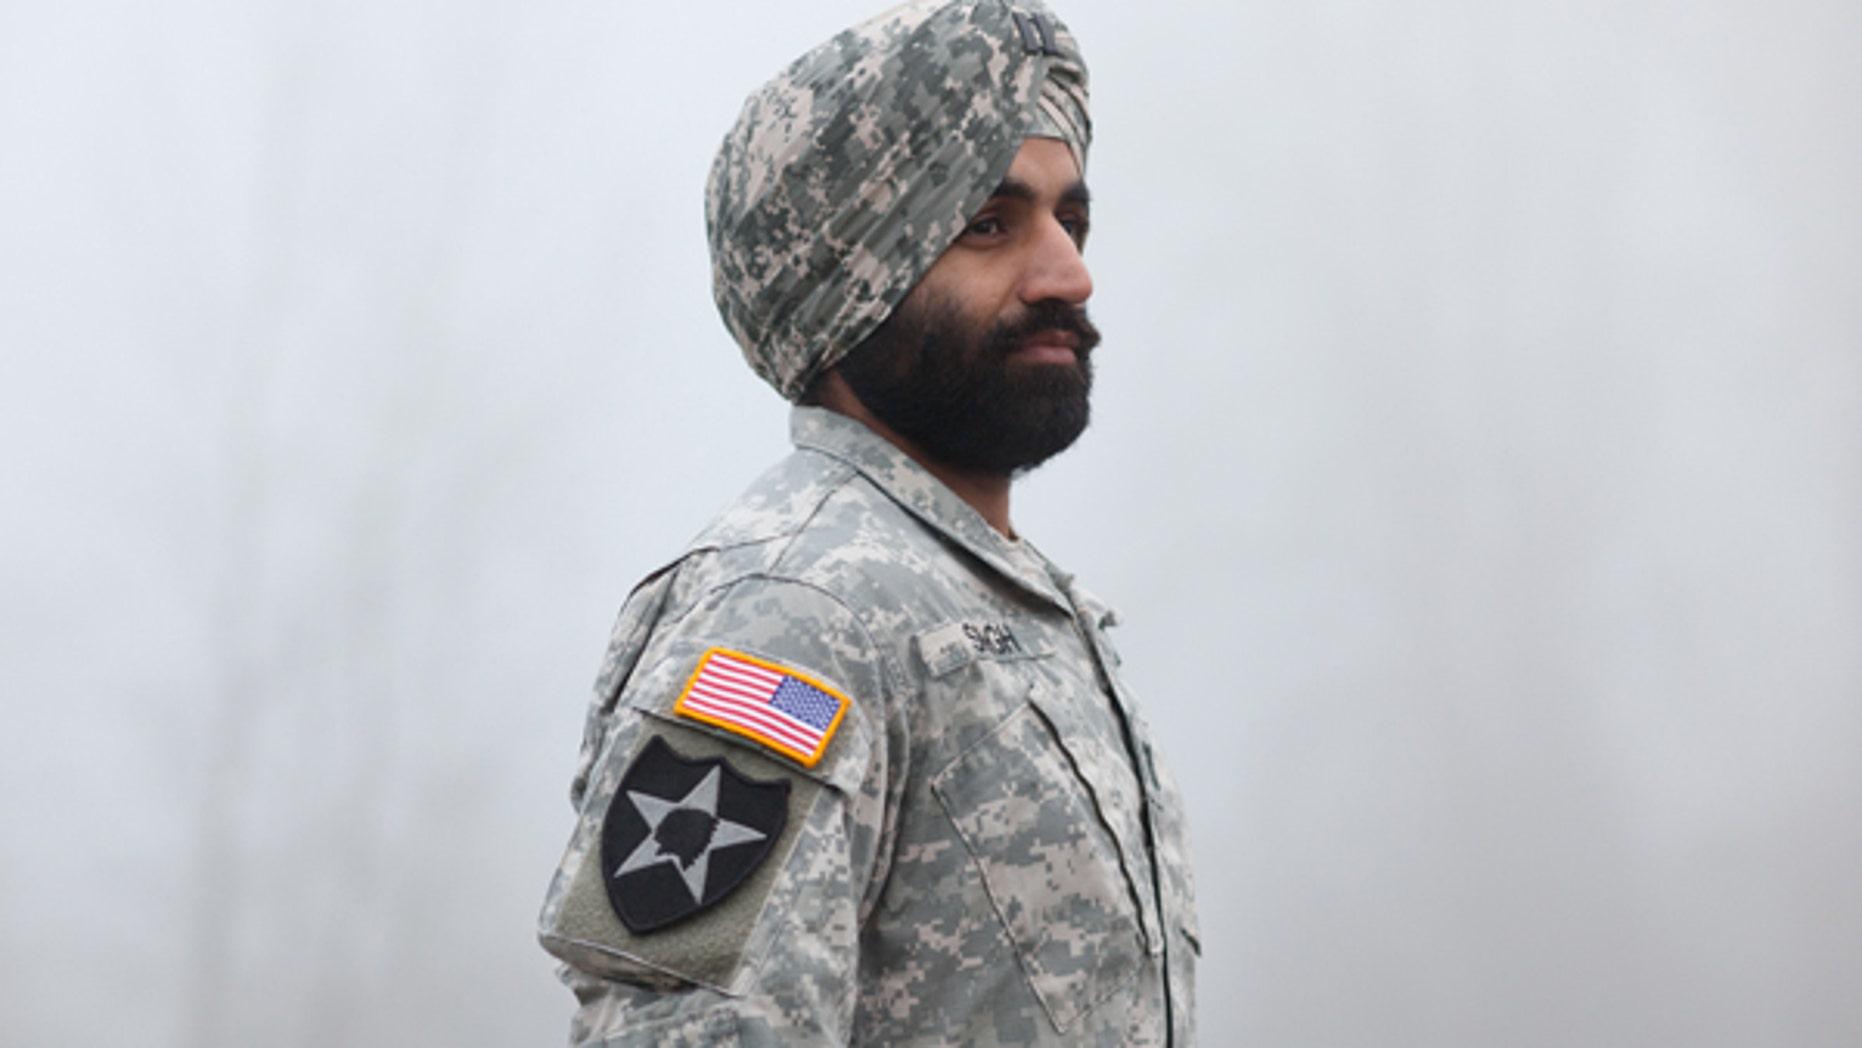 Capt. Simratpal Singh